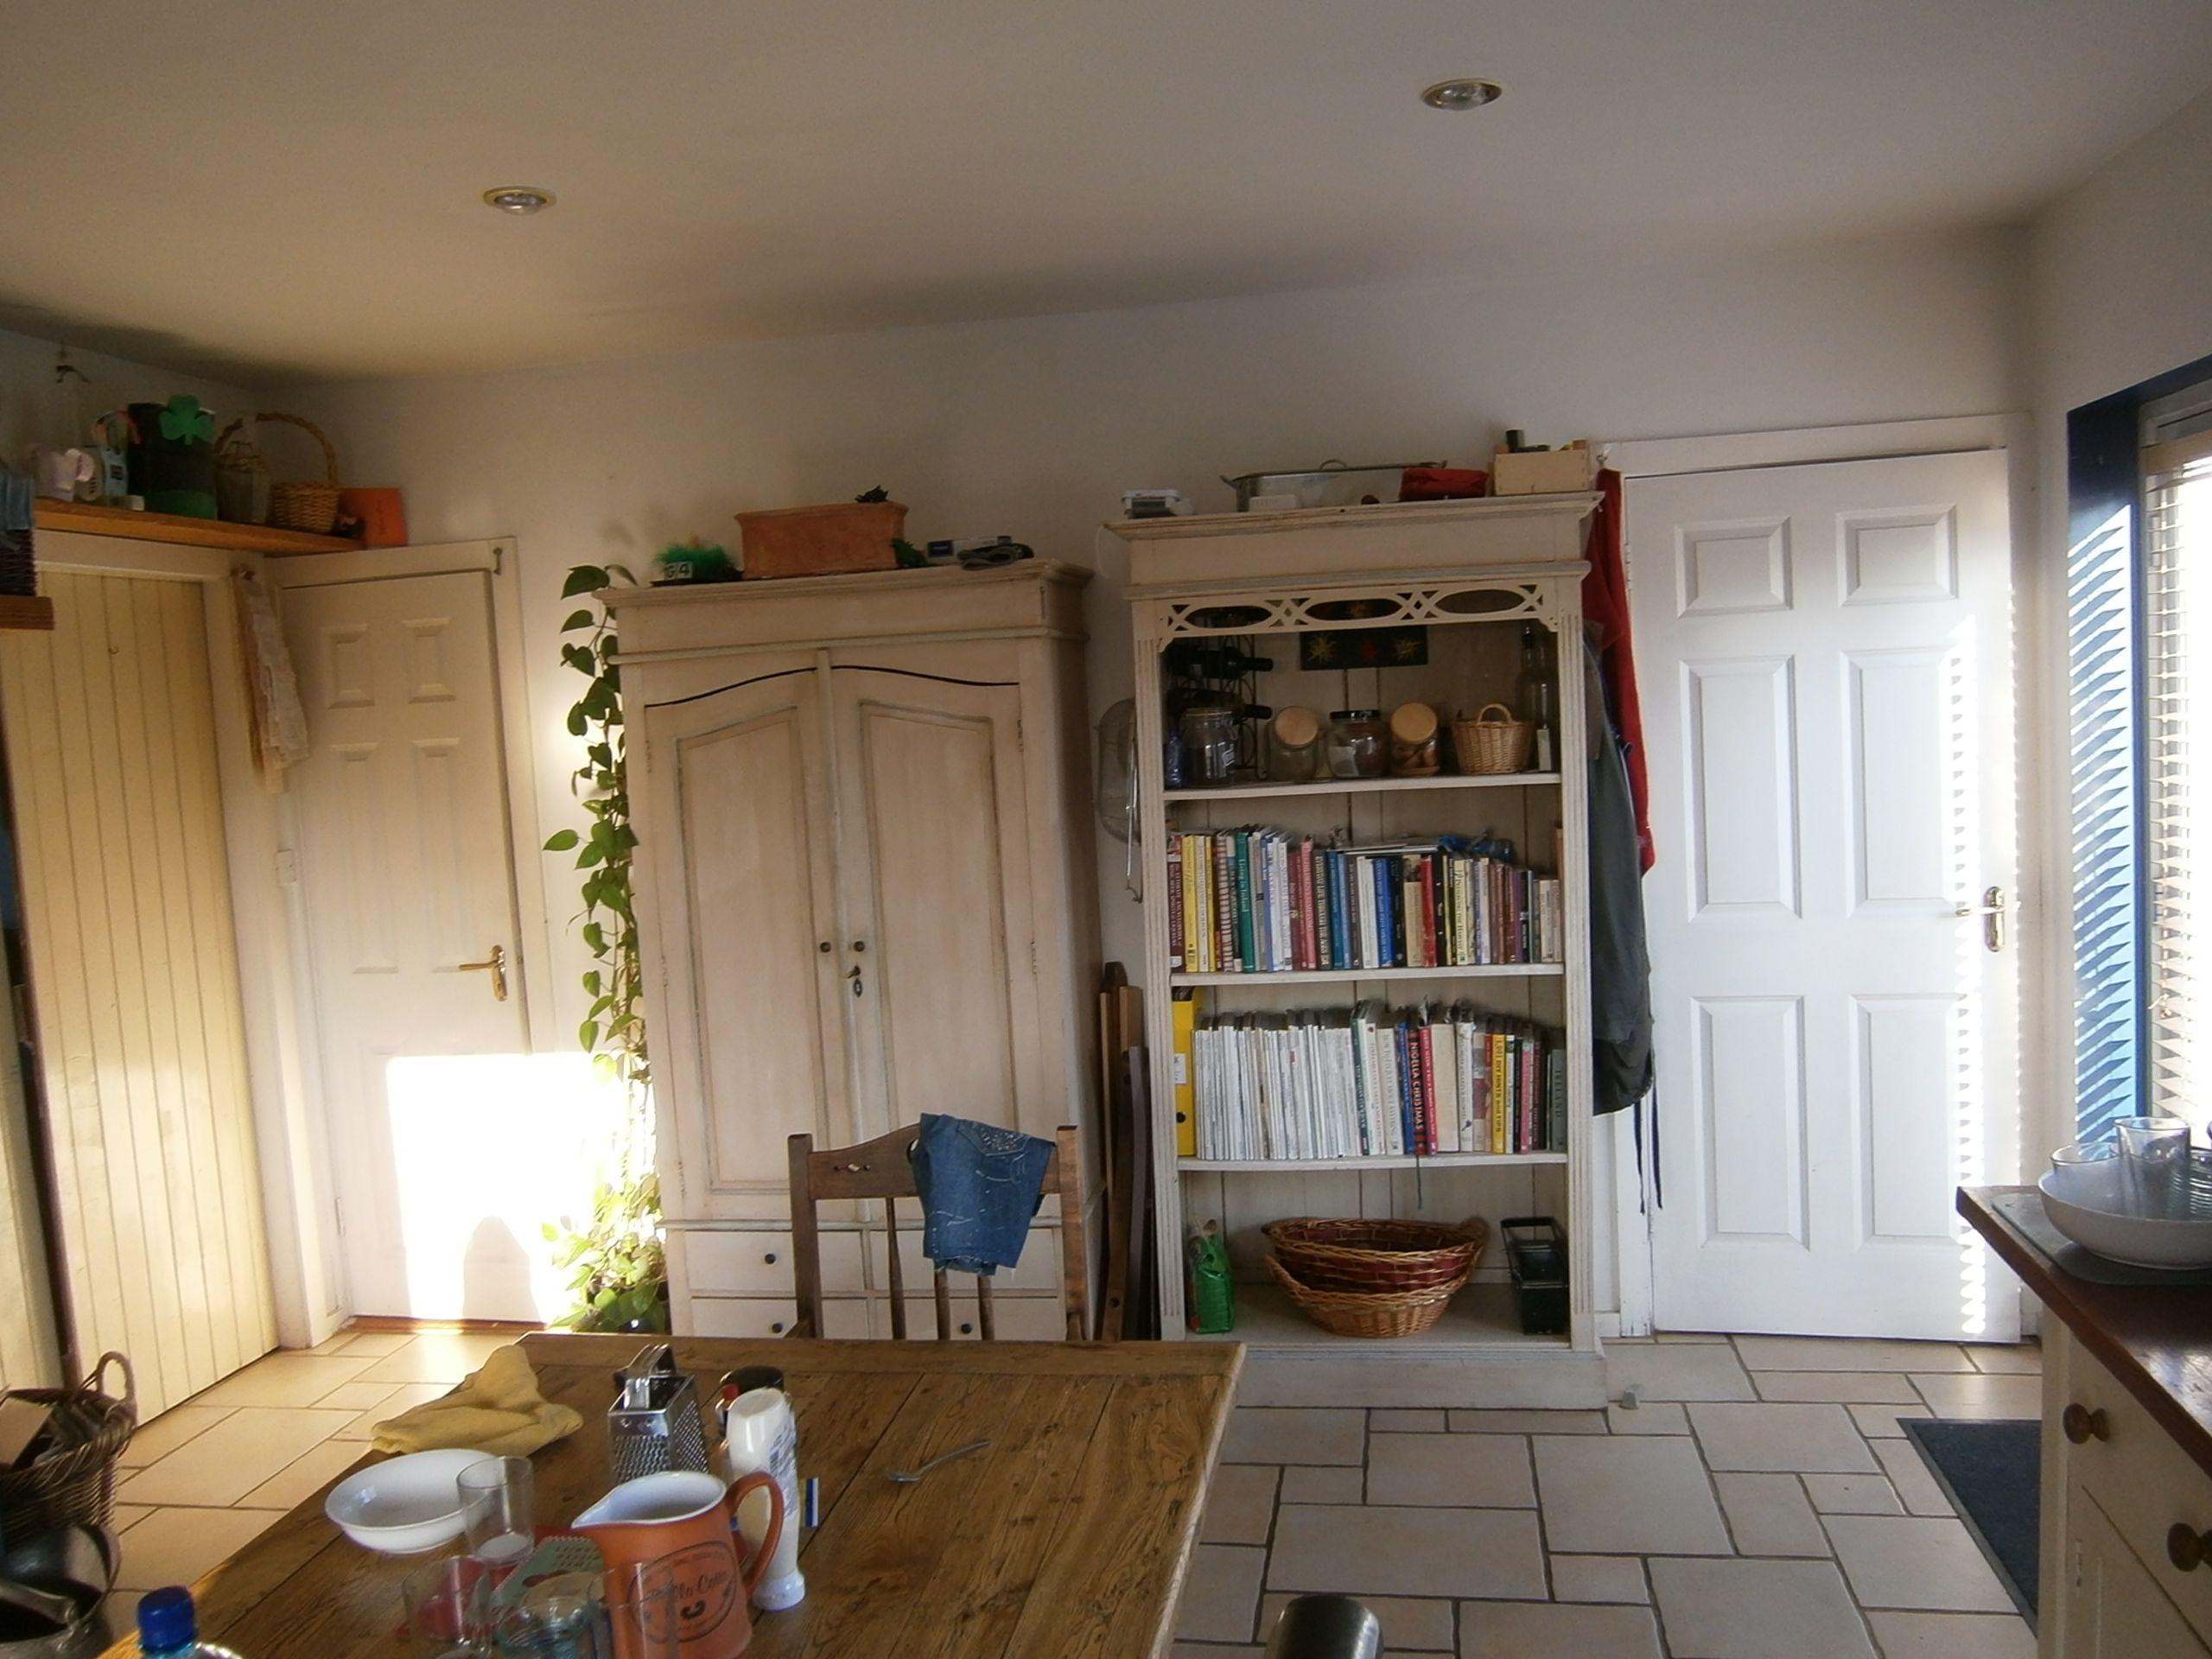 Interior of our cottage Wild Acres Glin GLIN CO LIMERICK